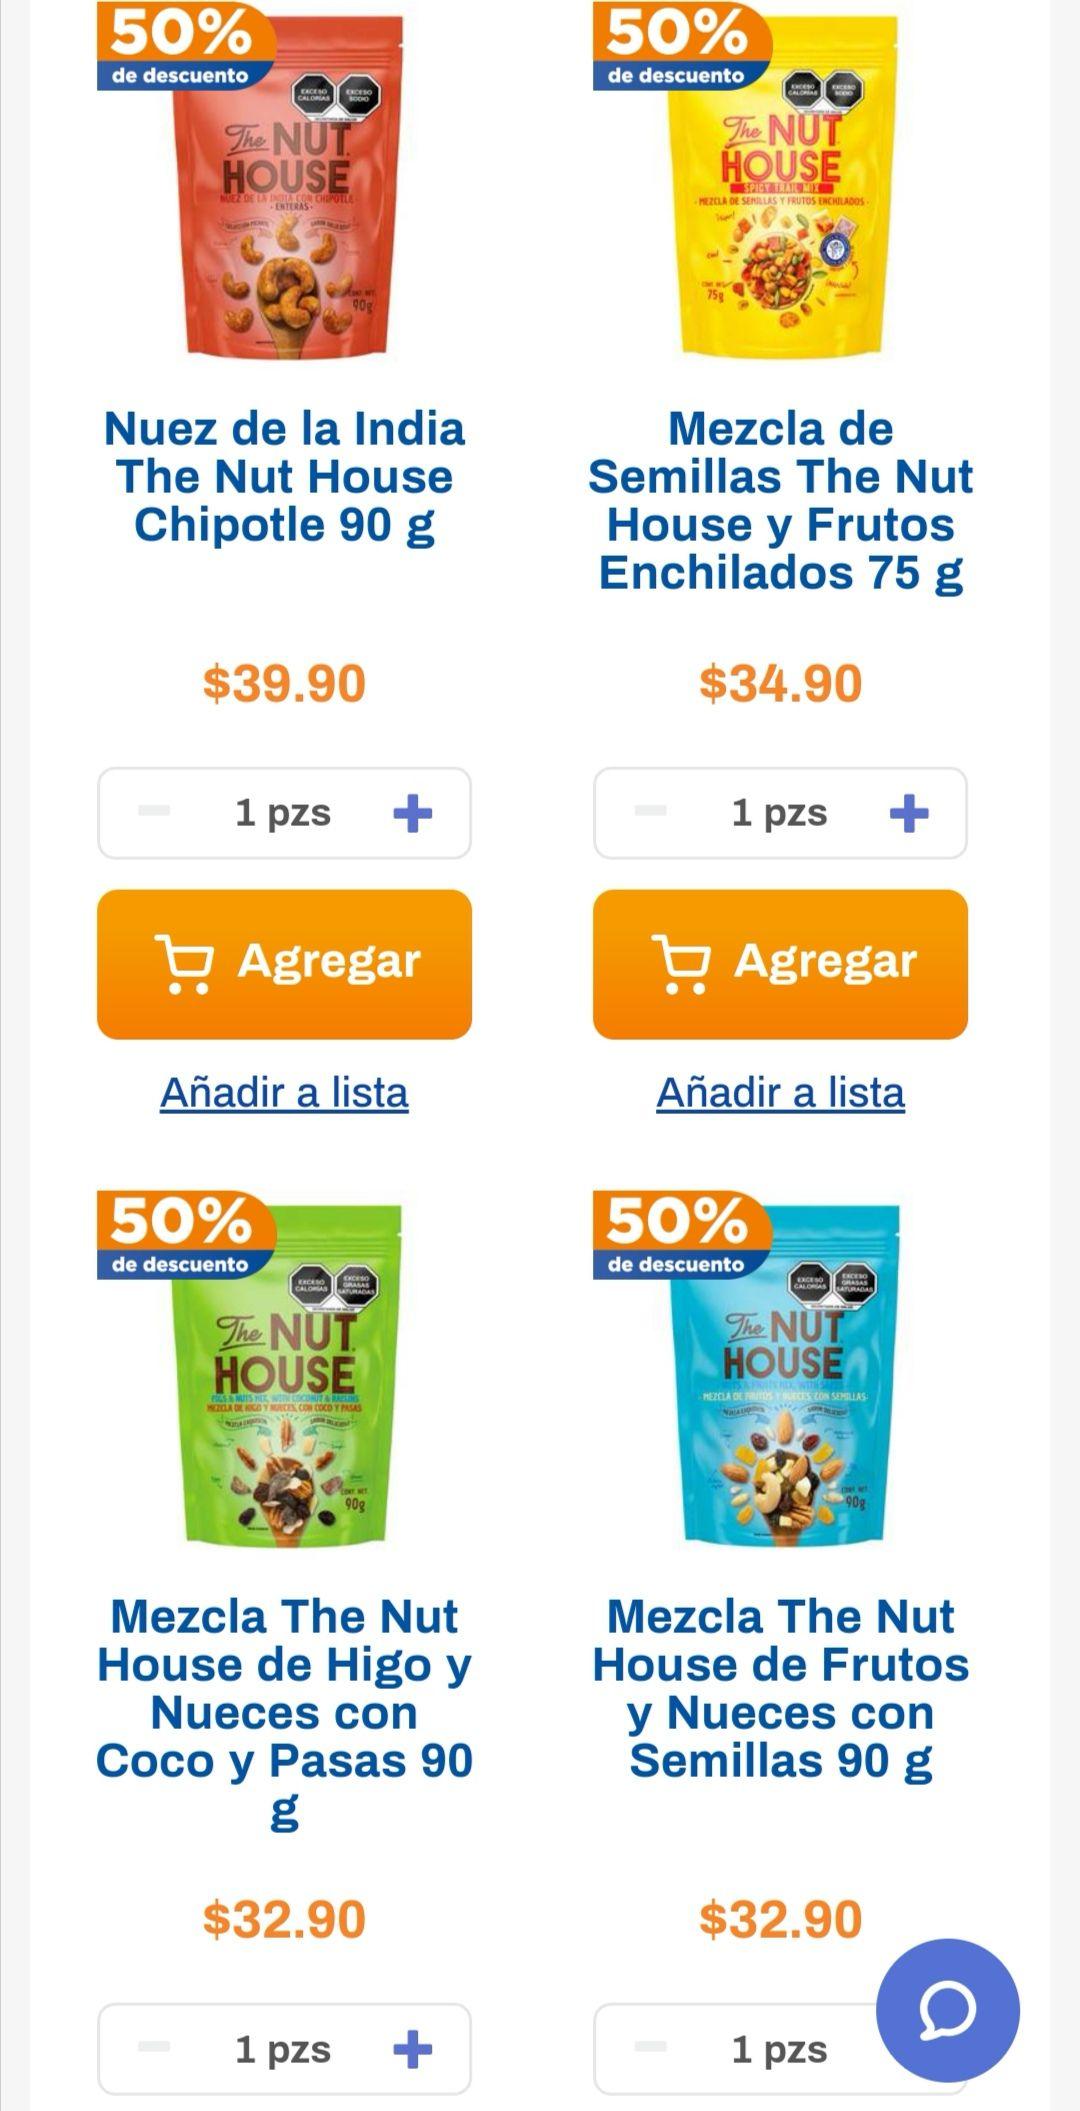 Chedraui: 50% de descuento en botanas Nuthouse doy pack